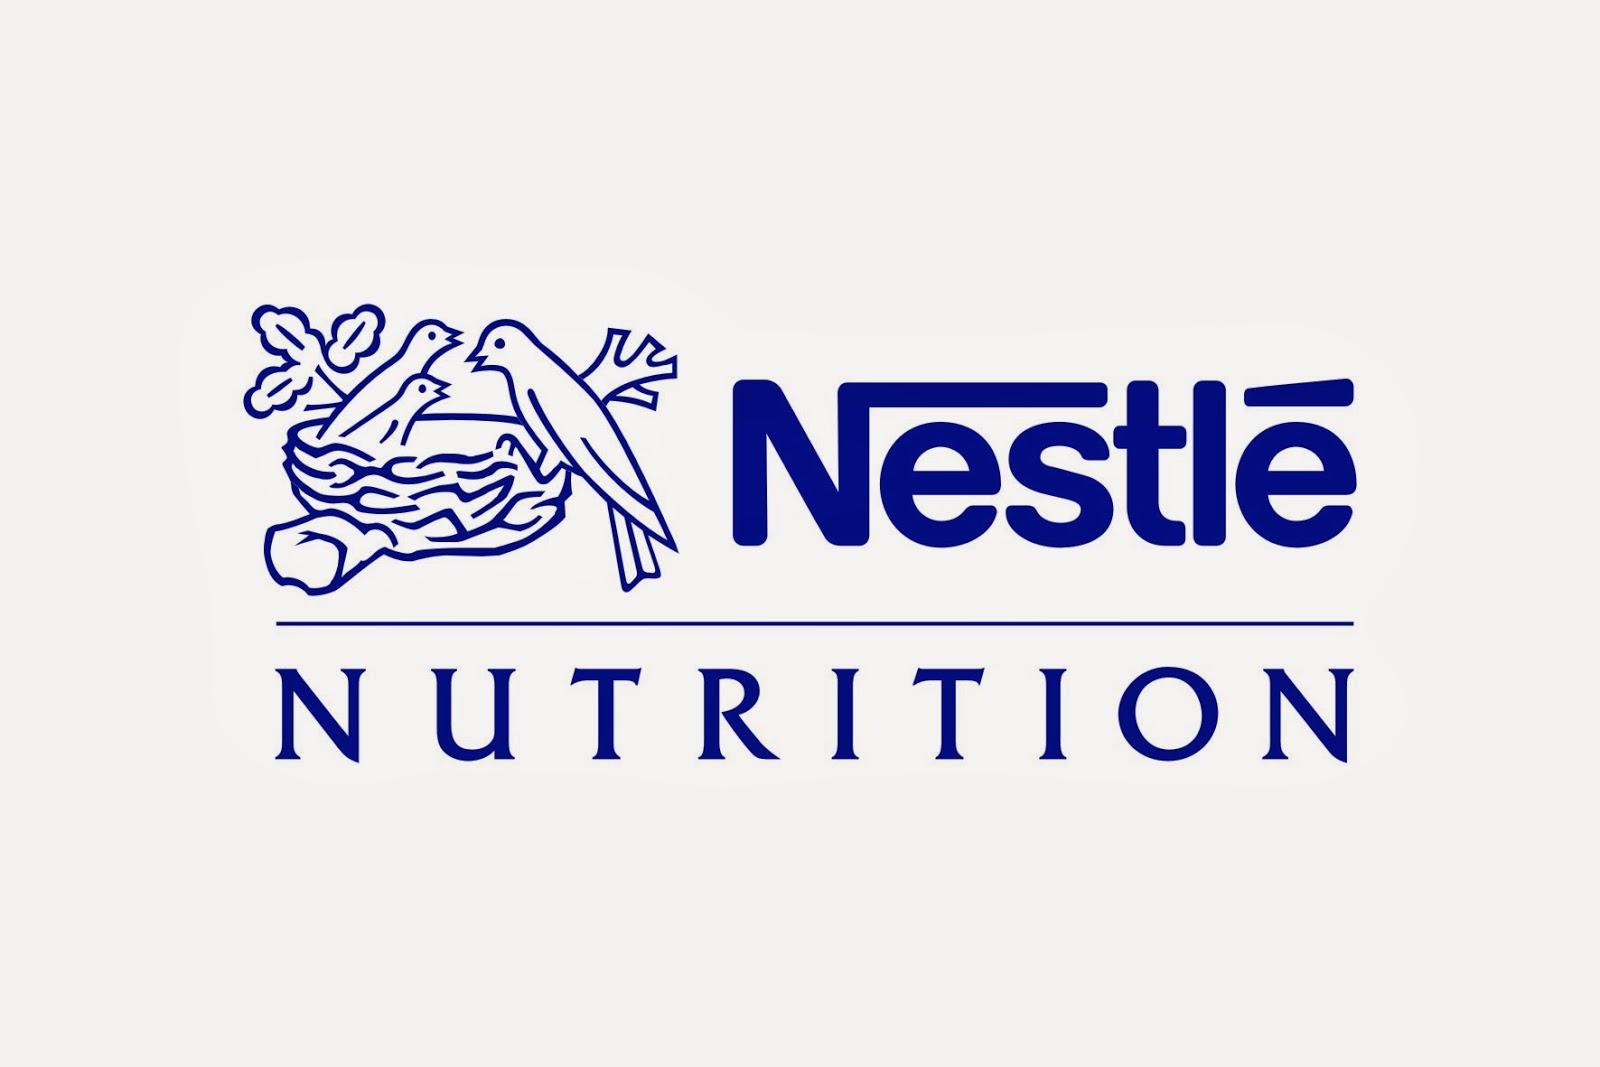 Nestle Logo | Logo Share: logo-share.blogspot.com/2013/12/nestle-logo.html